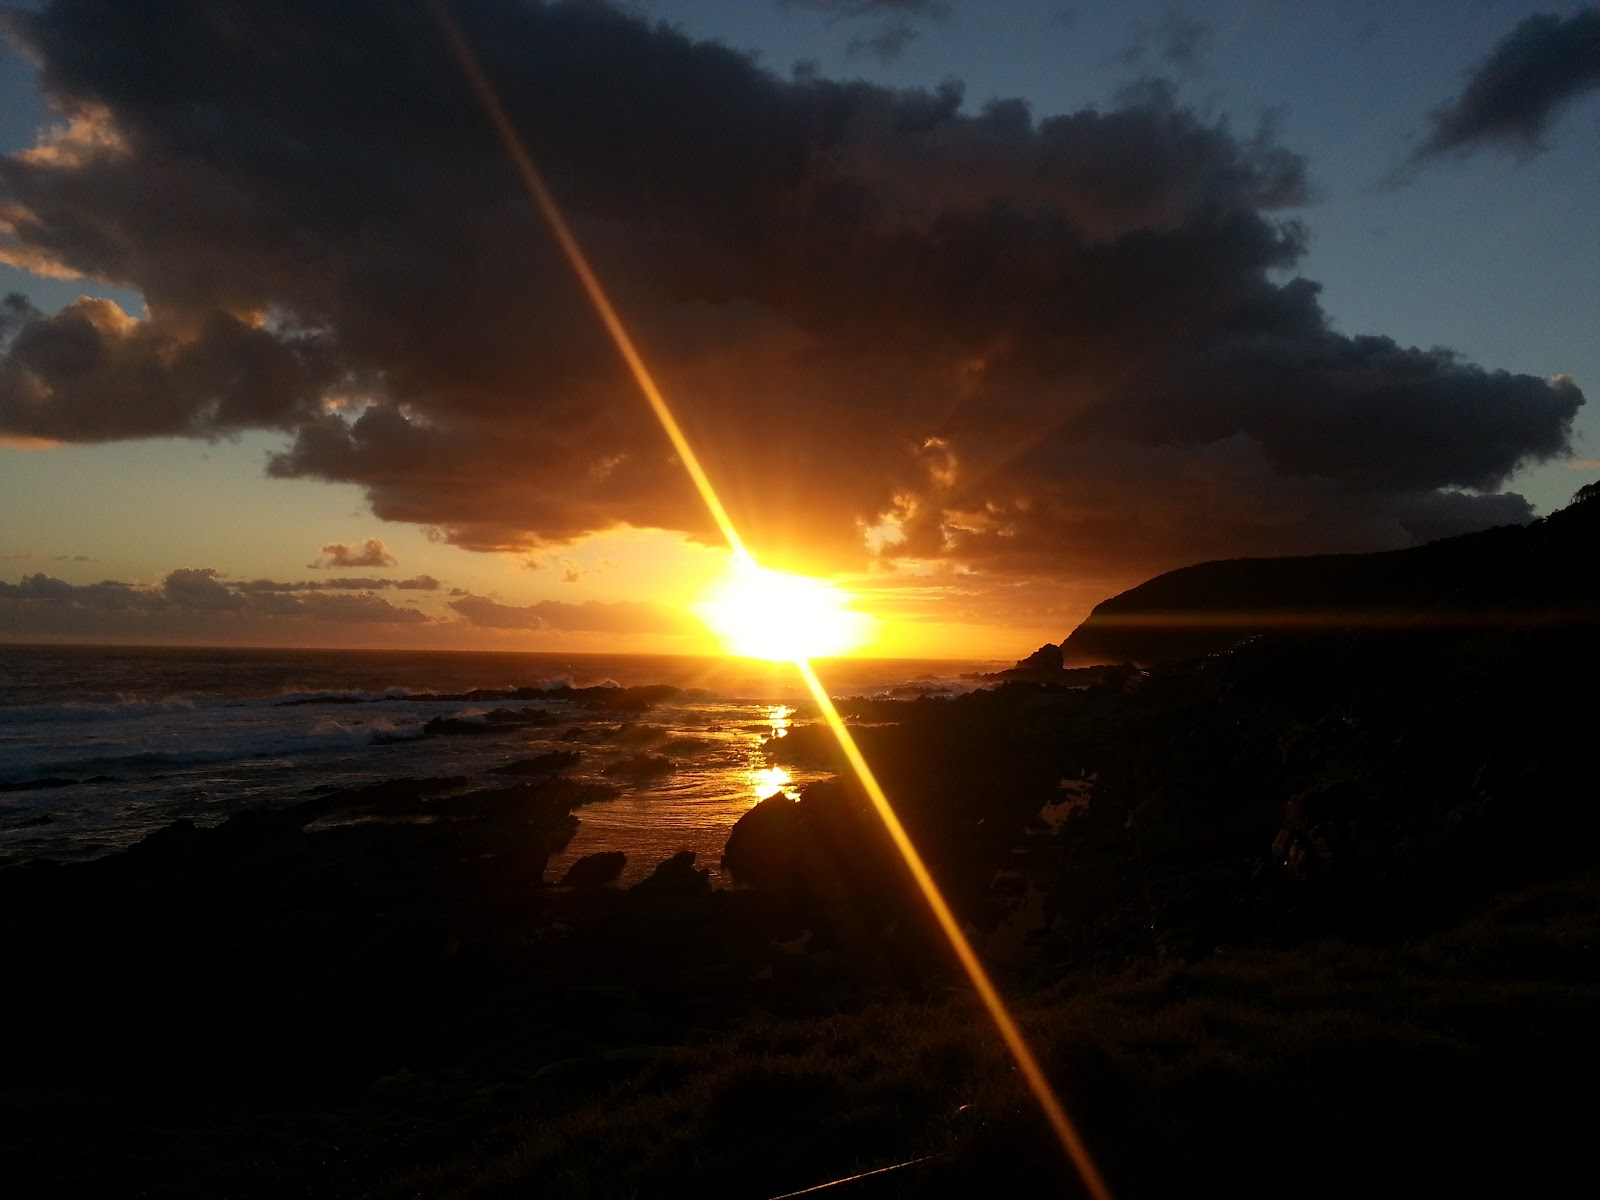 sunset-354516.jpg